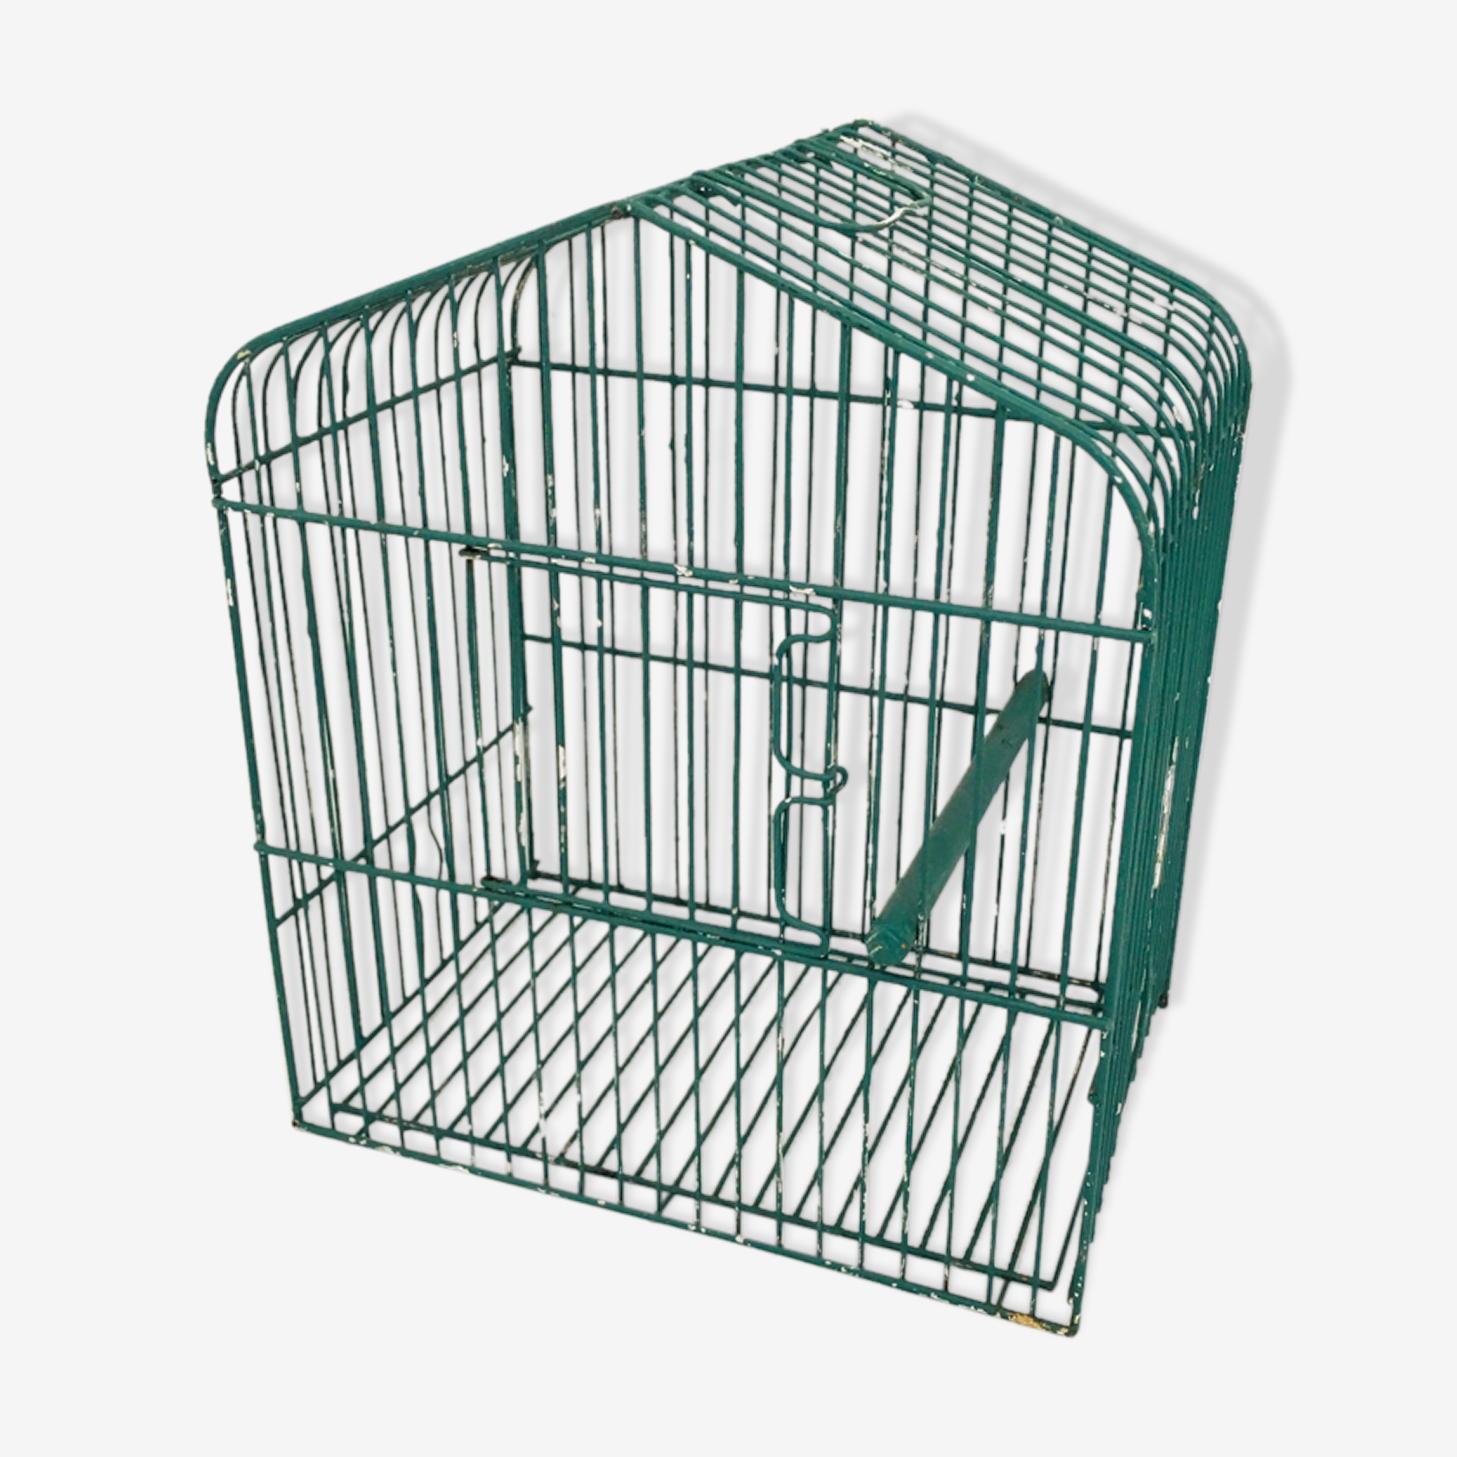 Vintage green metal birdcage